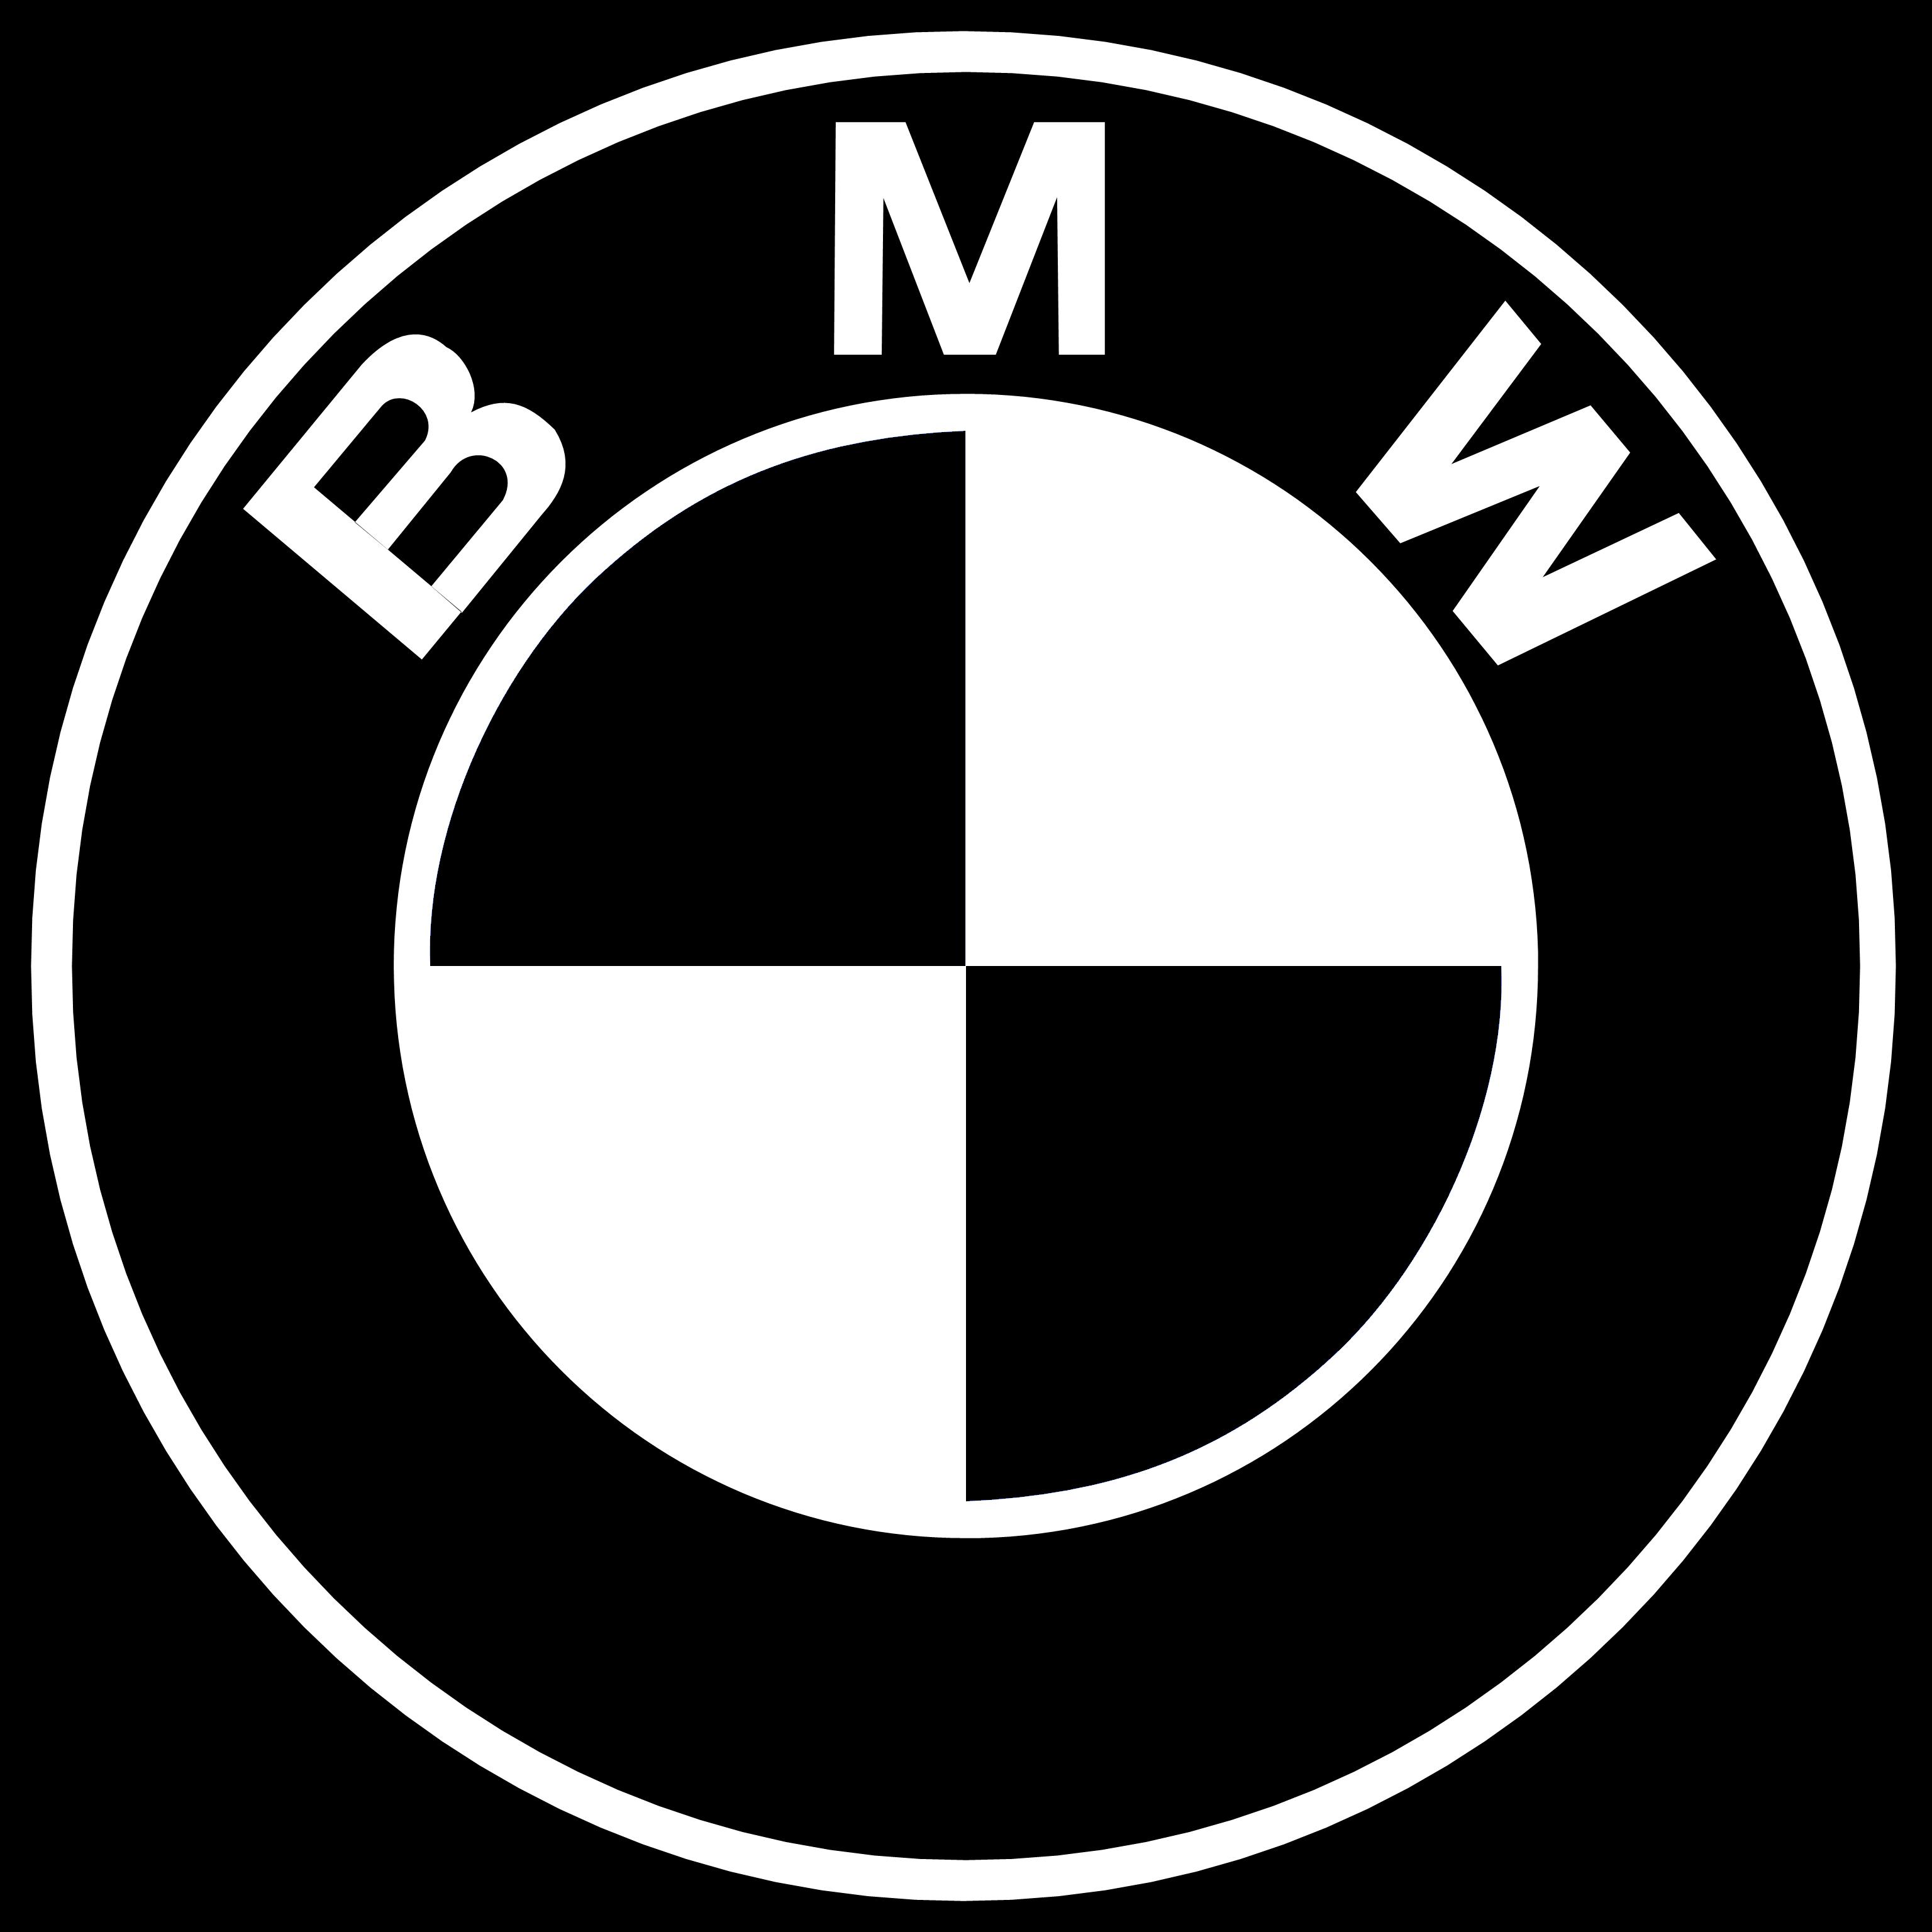 BMW F800GS, Albe's adv, adventure, motorcycle, BMW logo transparent